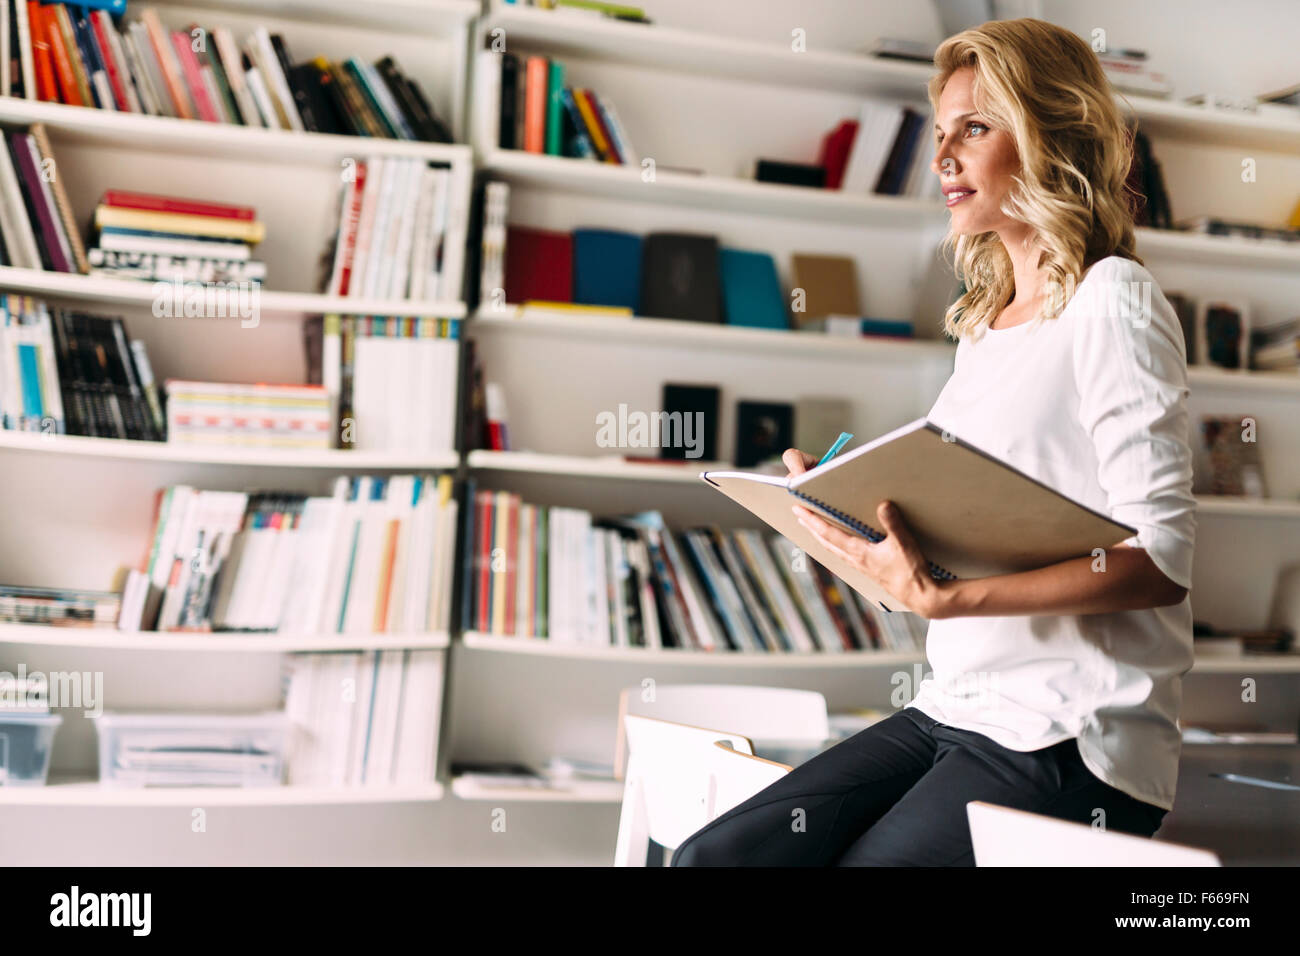 Stunning blonde woman reading - Stock Image